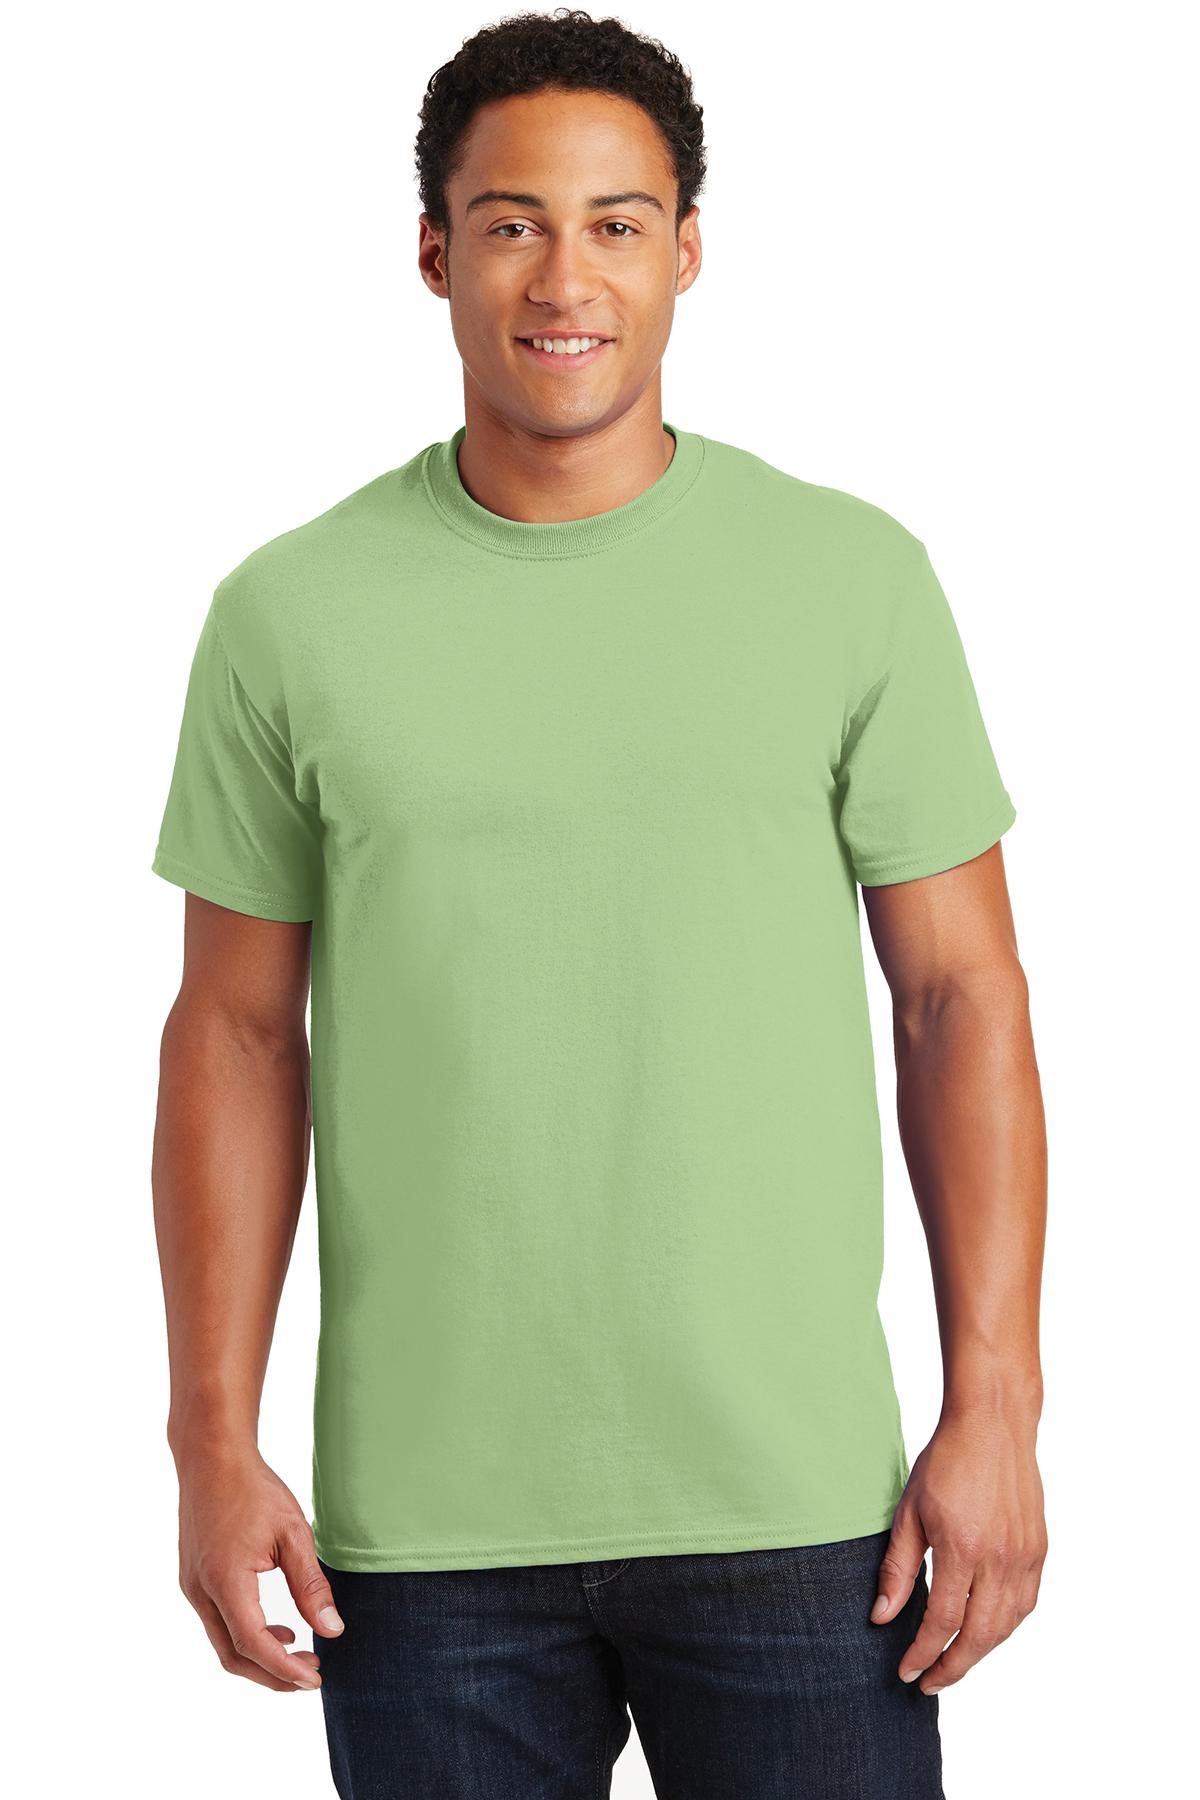 Royal Green Jackets T-Shirt 100/% Cotton heather grey